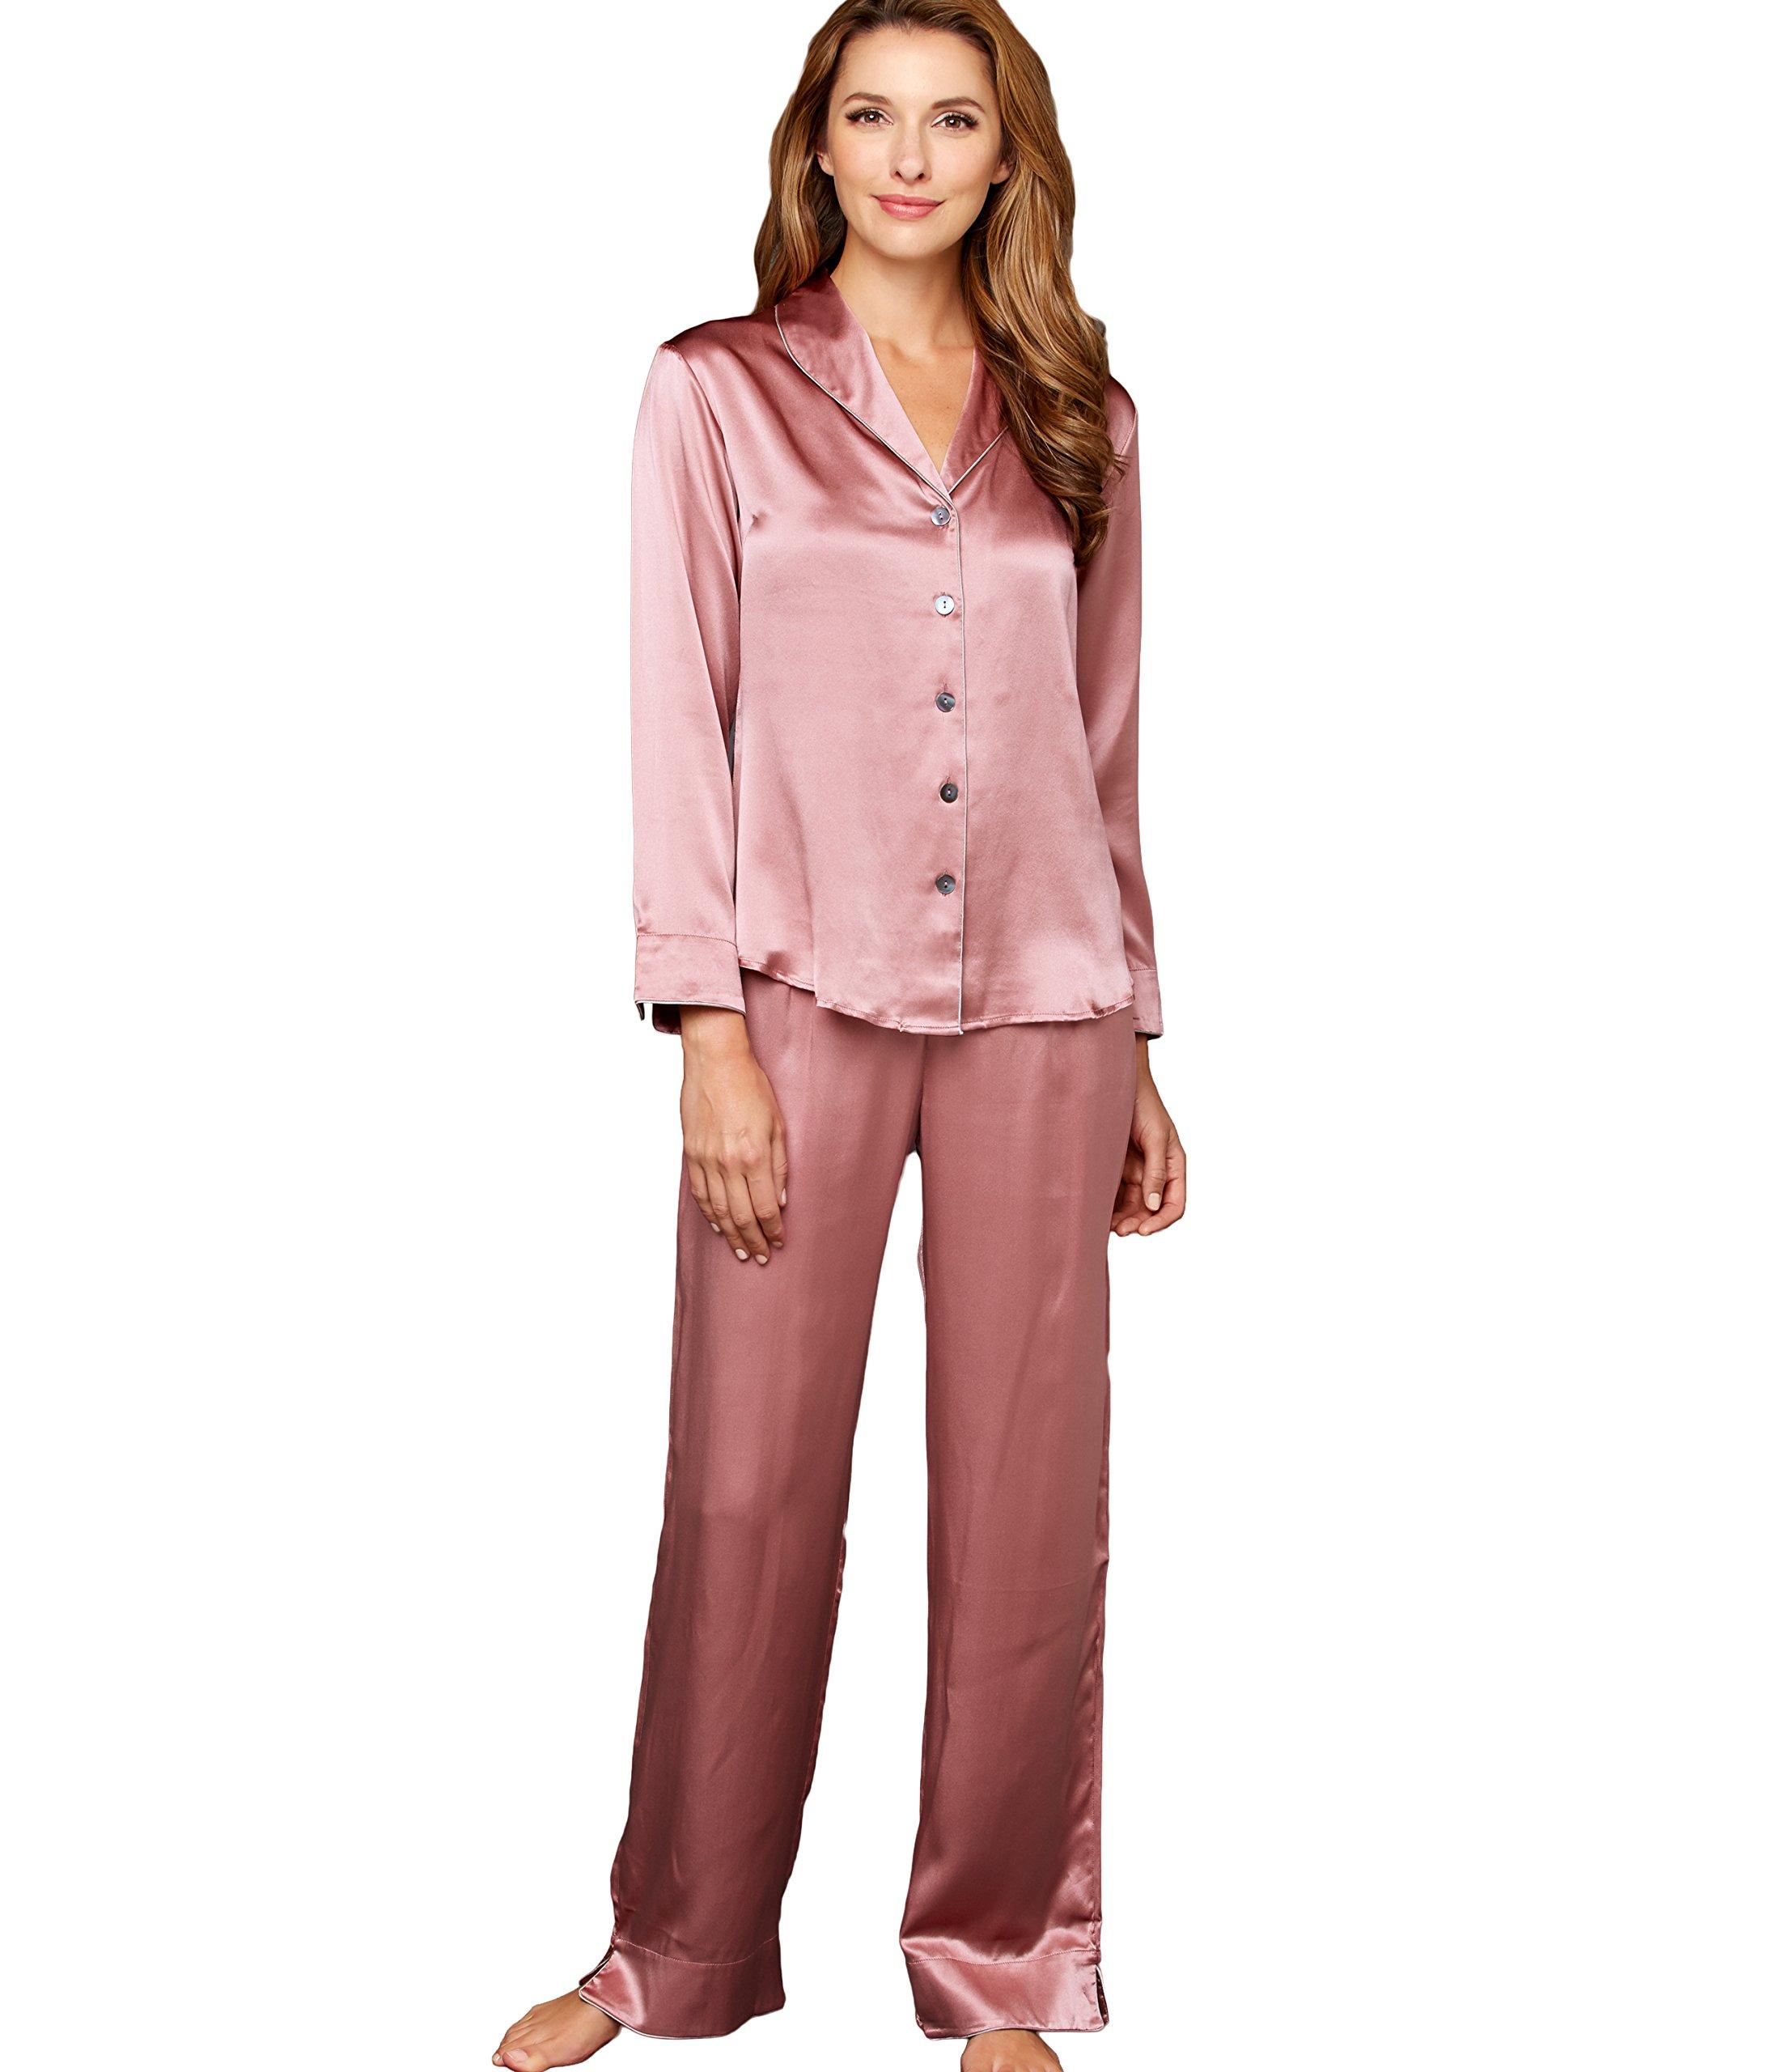 Julianna Rae Natalya Women's 100% Silk Pajamas, Petite, Kirsch, MP by Julianna Rae